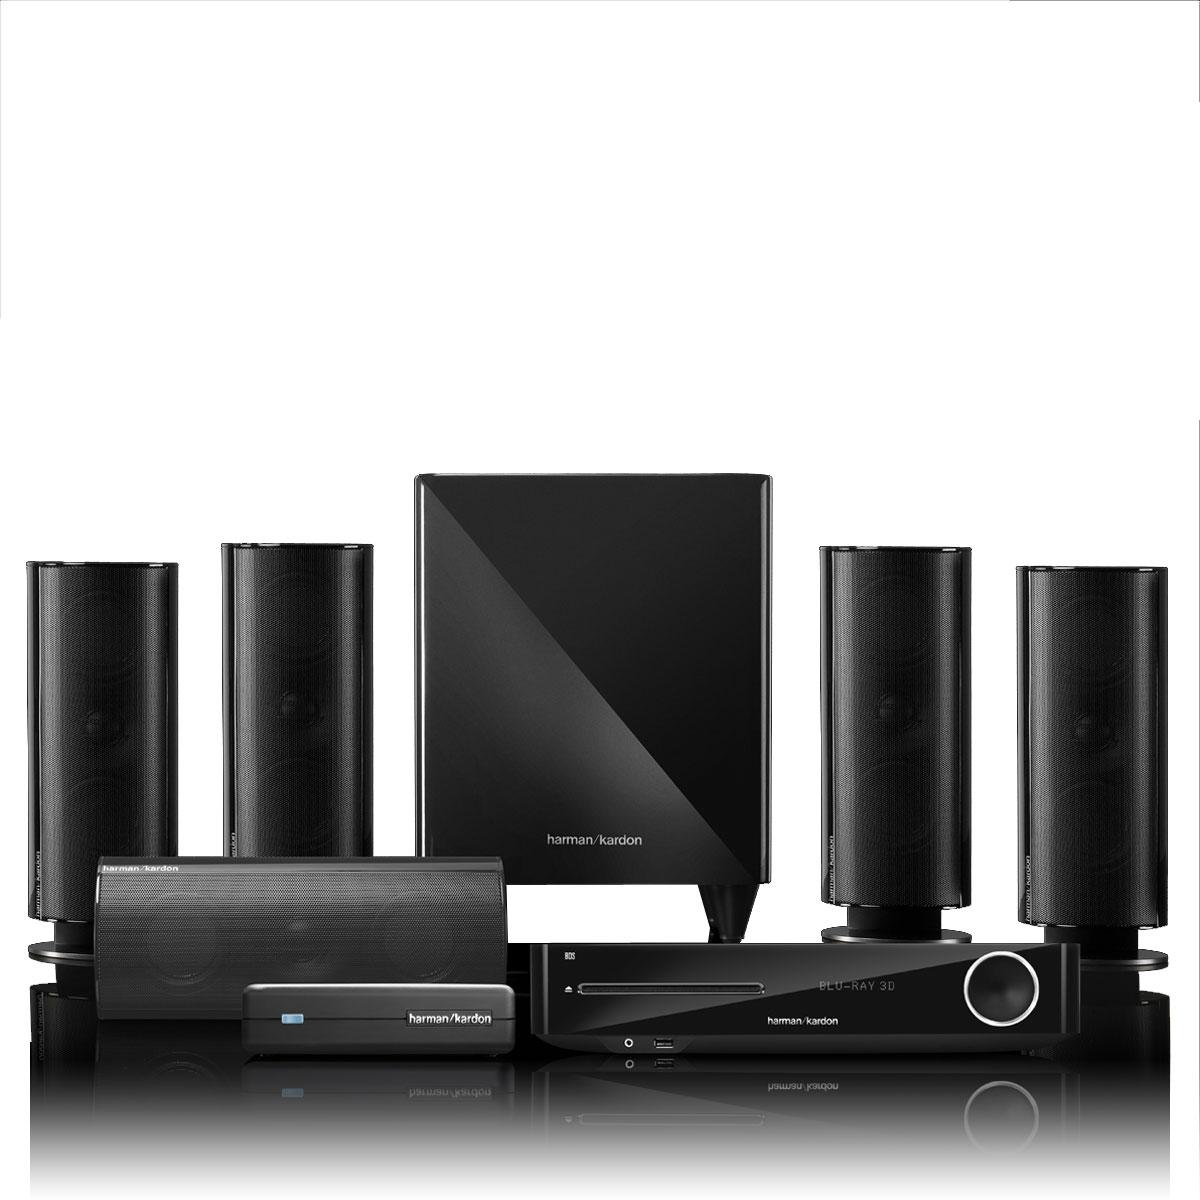 harman kardon bds 877 ensemble home cin ma harman kardon sur. Black Bedroom Furniture Sets. Home Design Ideas